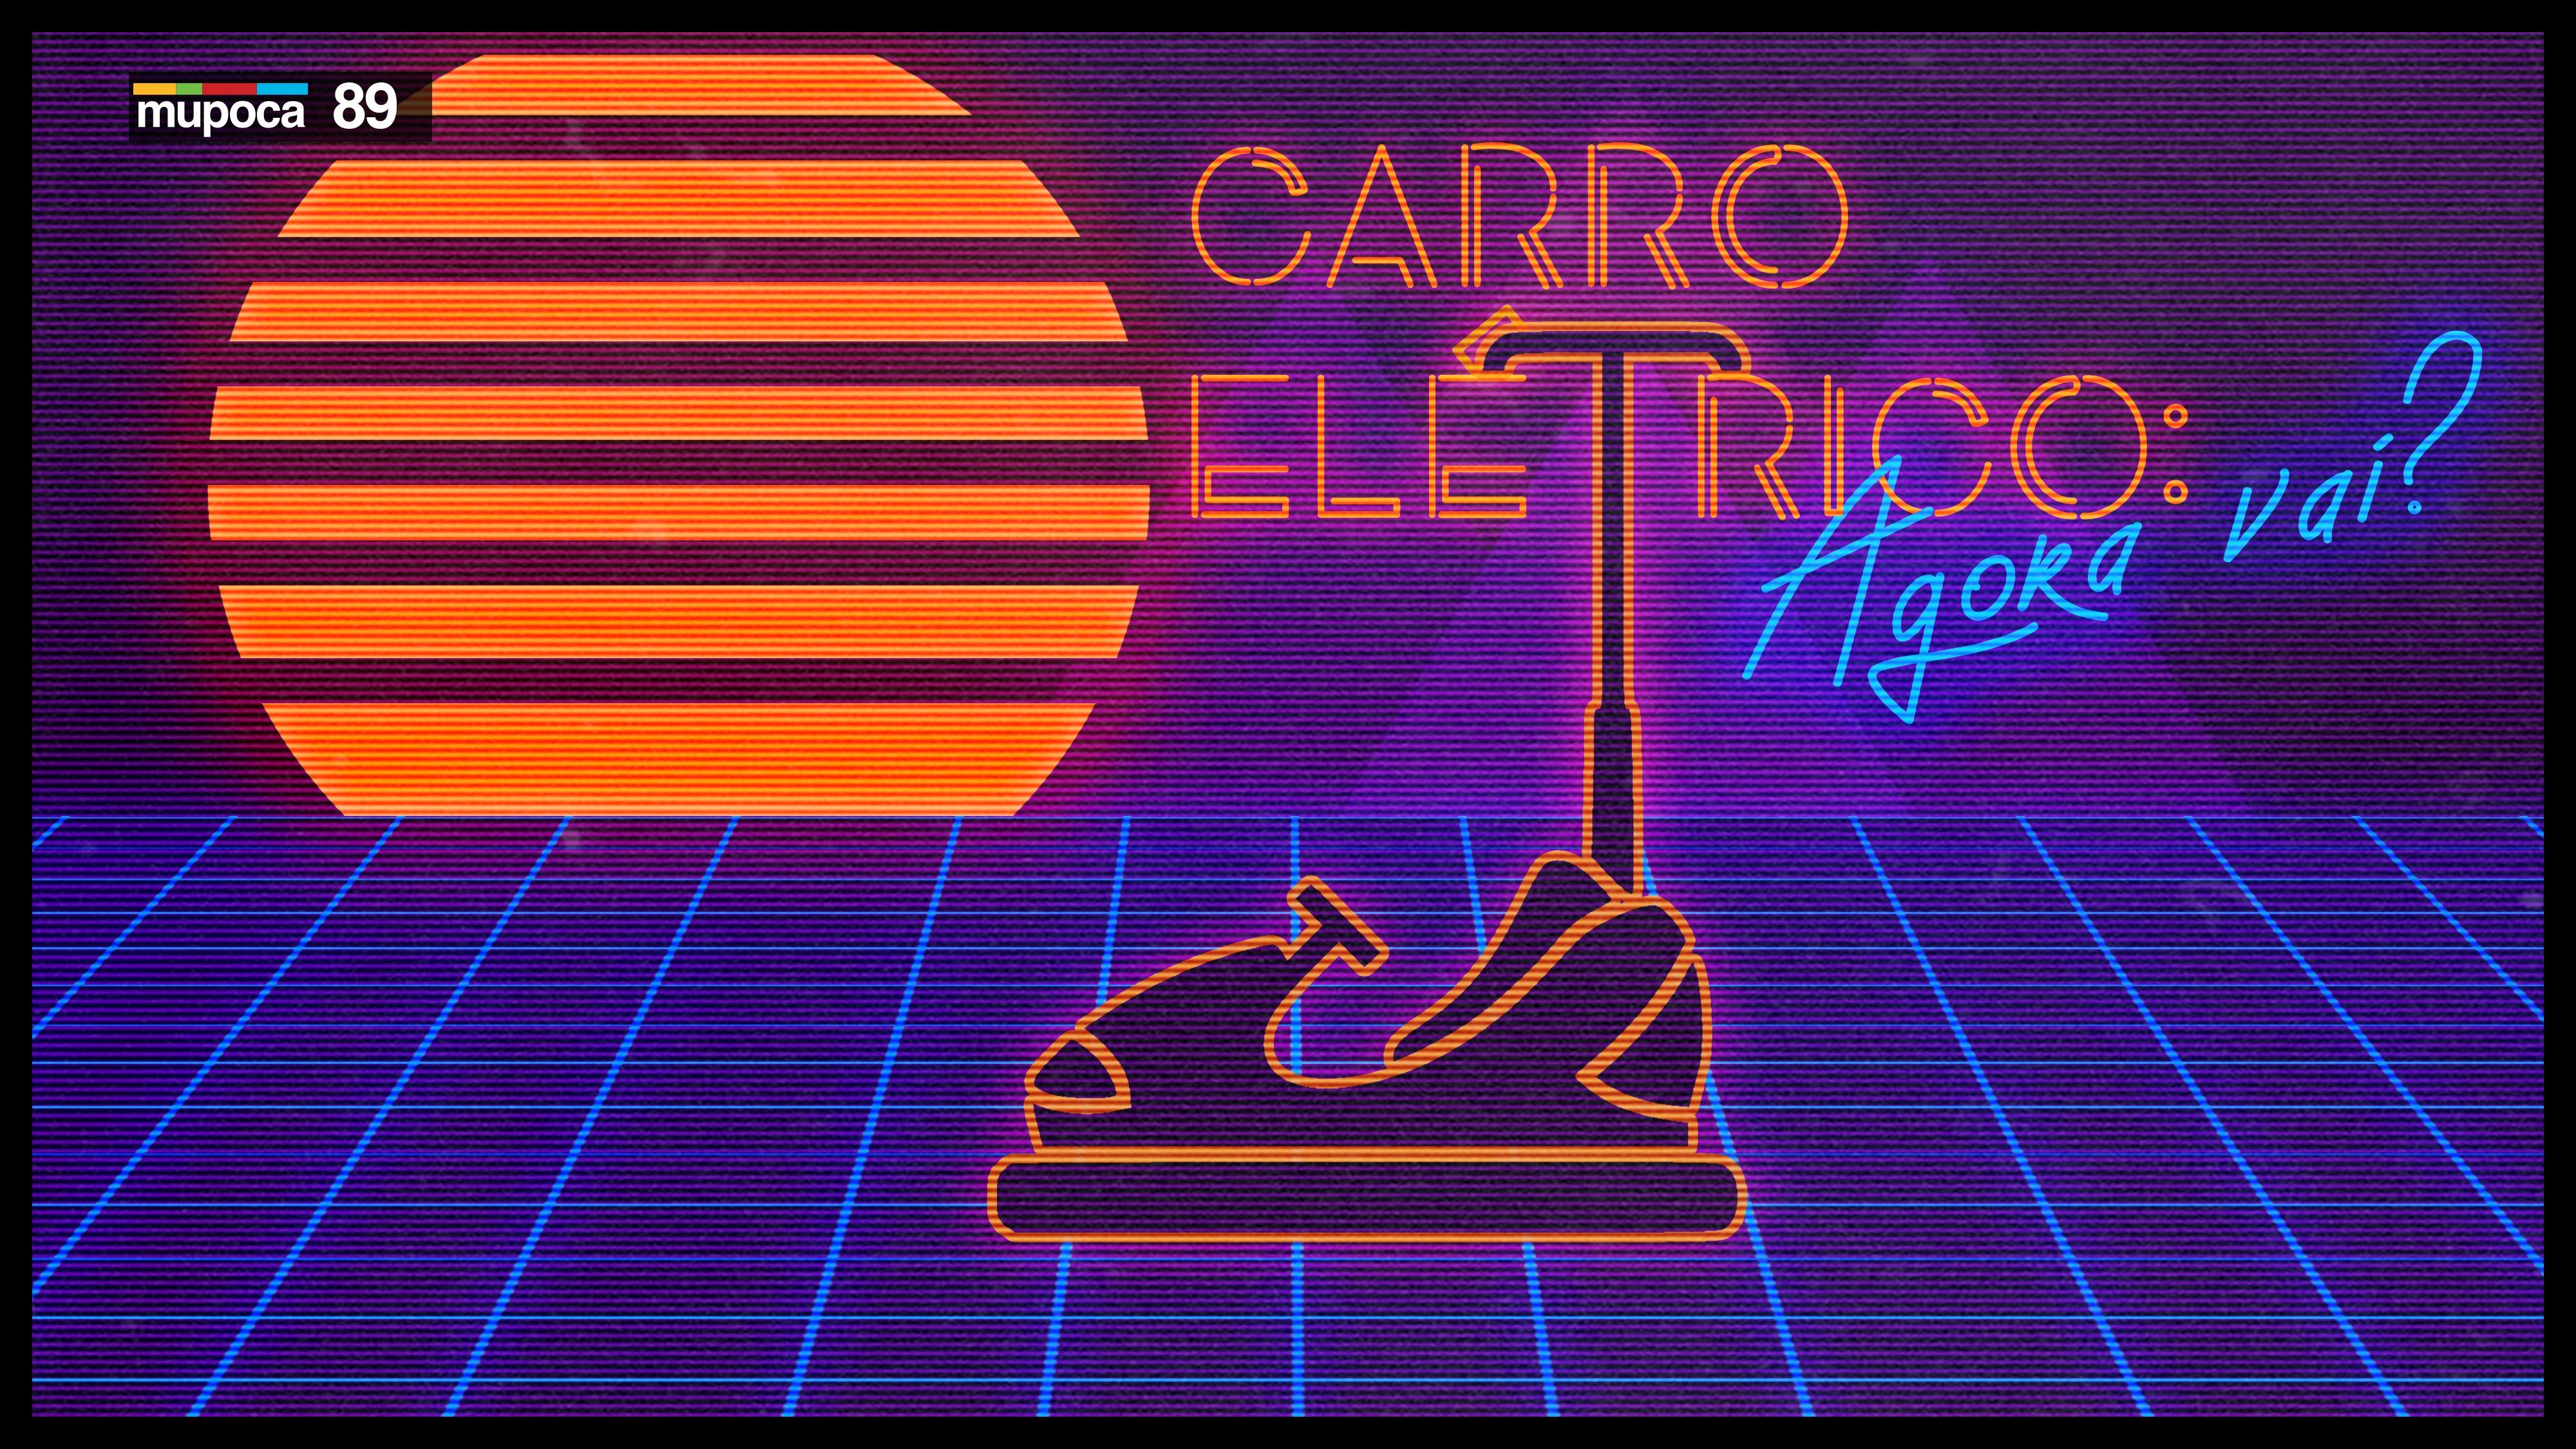 Mupoca #089 – Carro elétrico, agora vai?